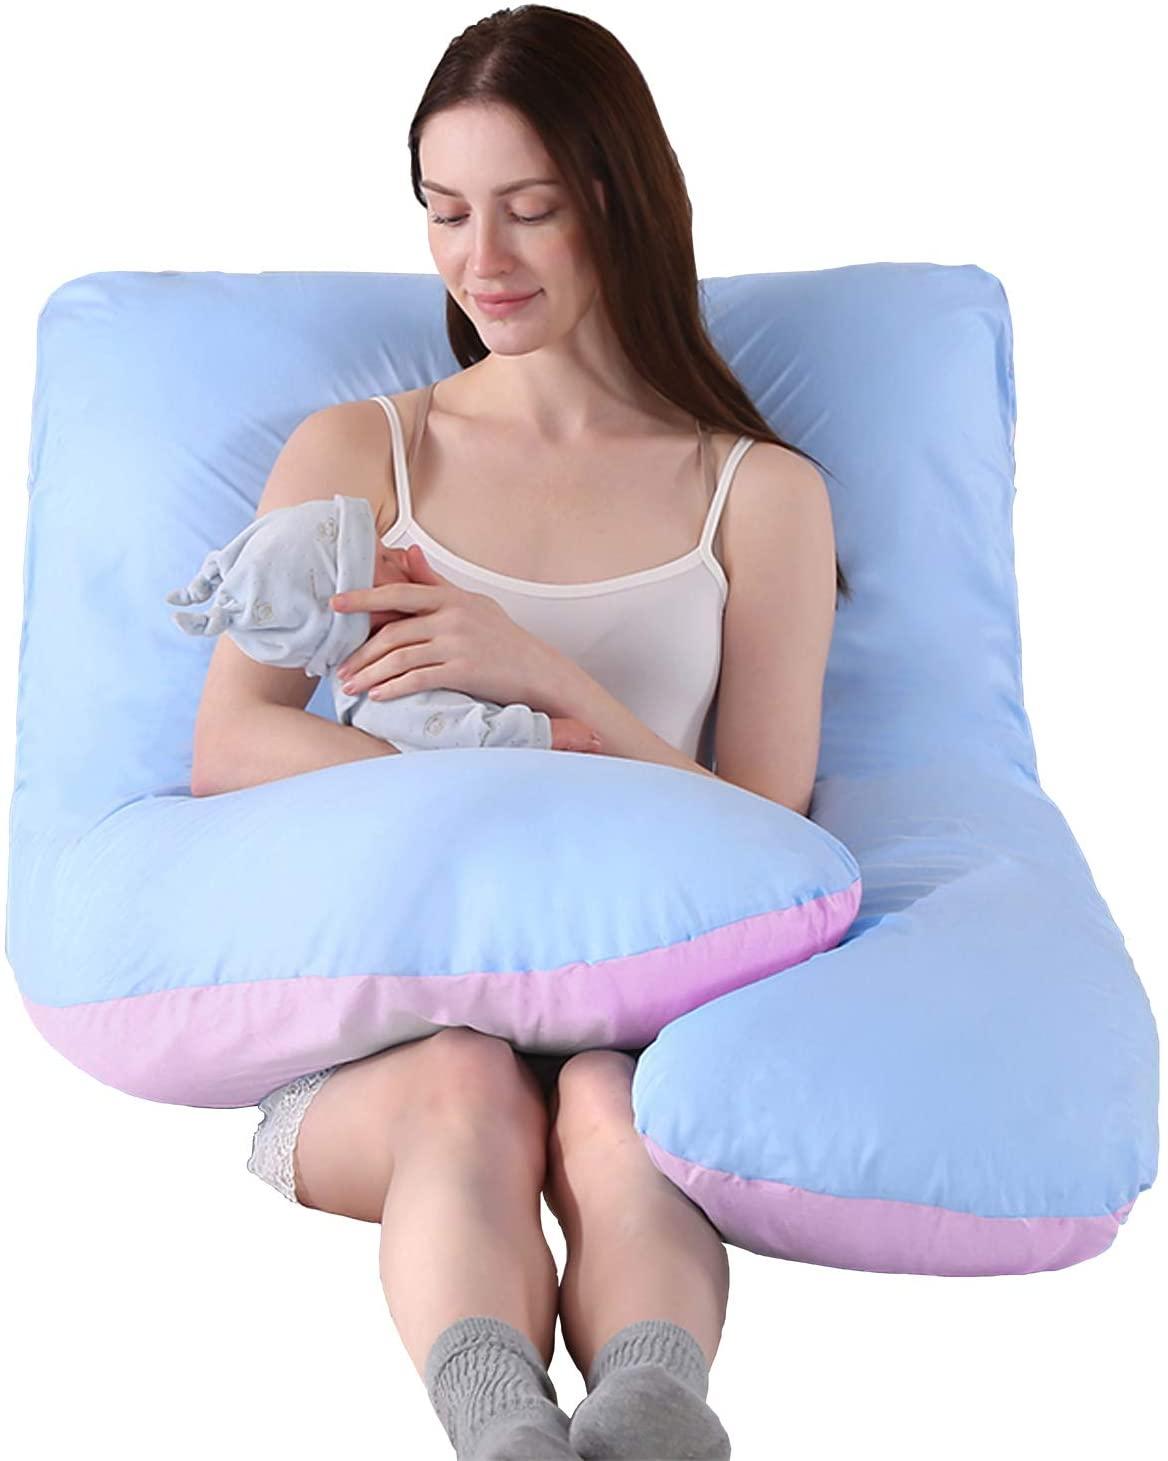 130x70cm u forma gravidez travesseiro maternidade apoio do corpo travesseiro corpo travesseiro para grávidas lado sleepers cama travesseiros